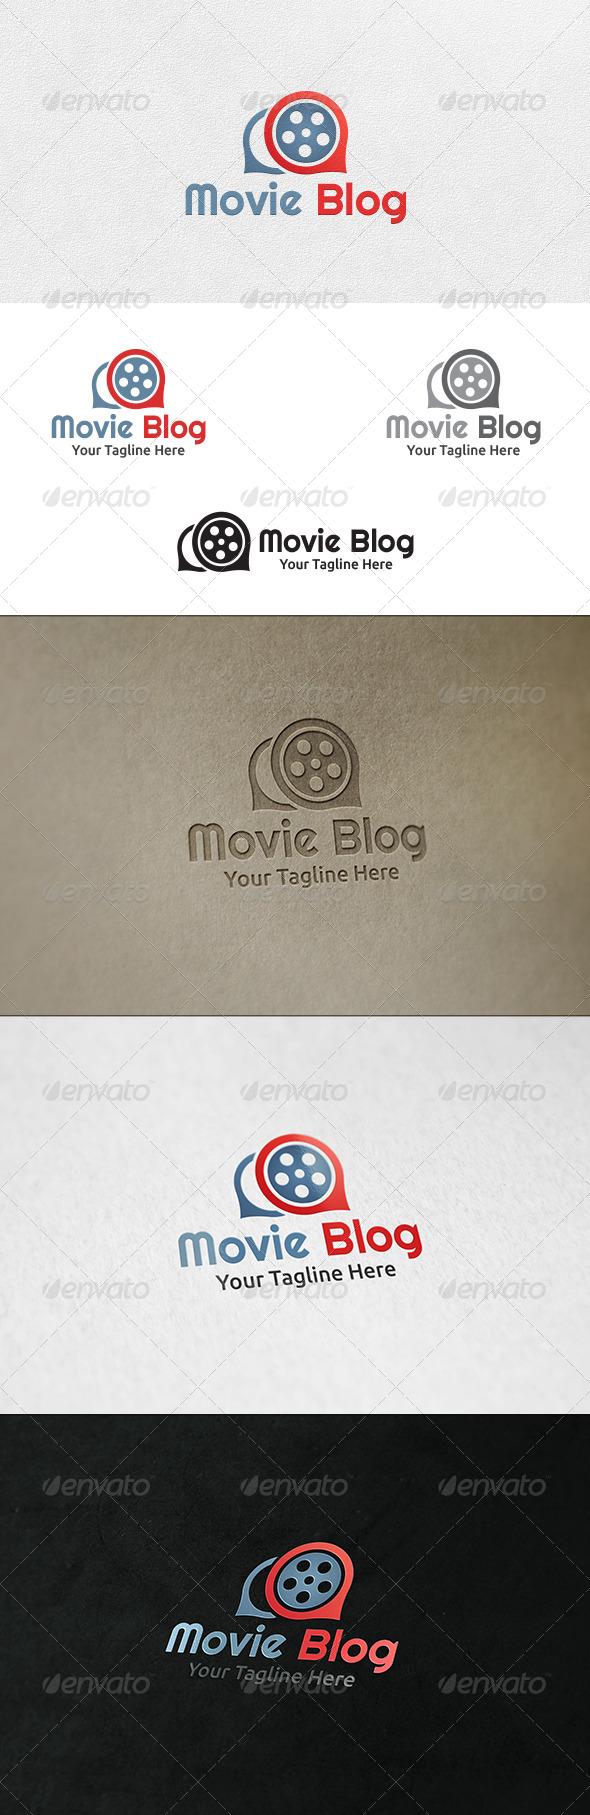 Movie Blog - Logo Template